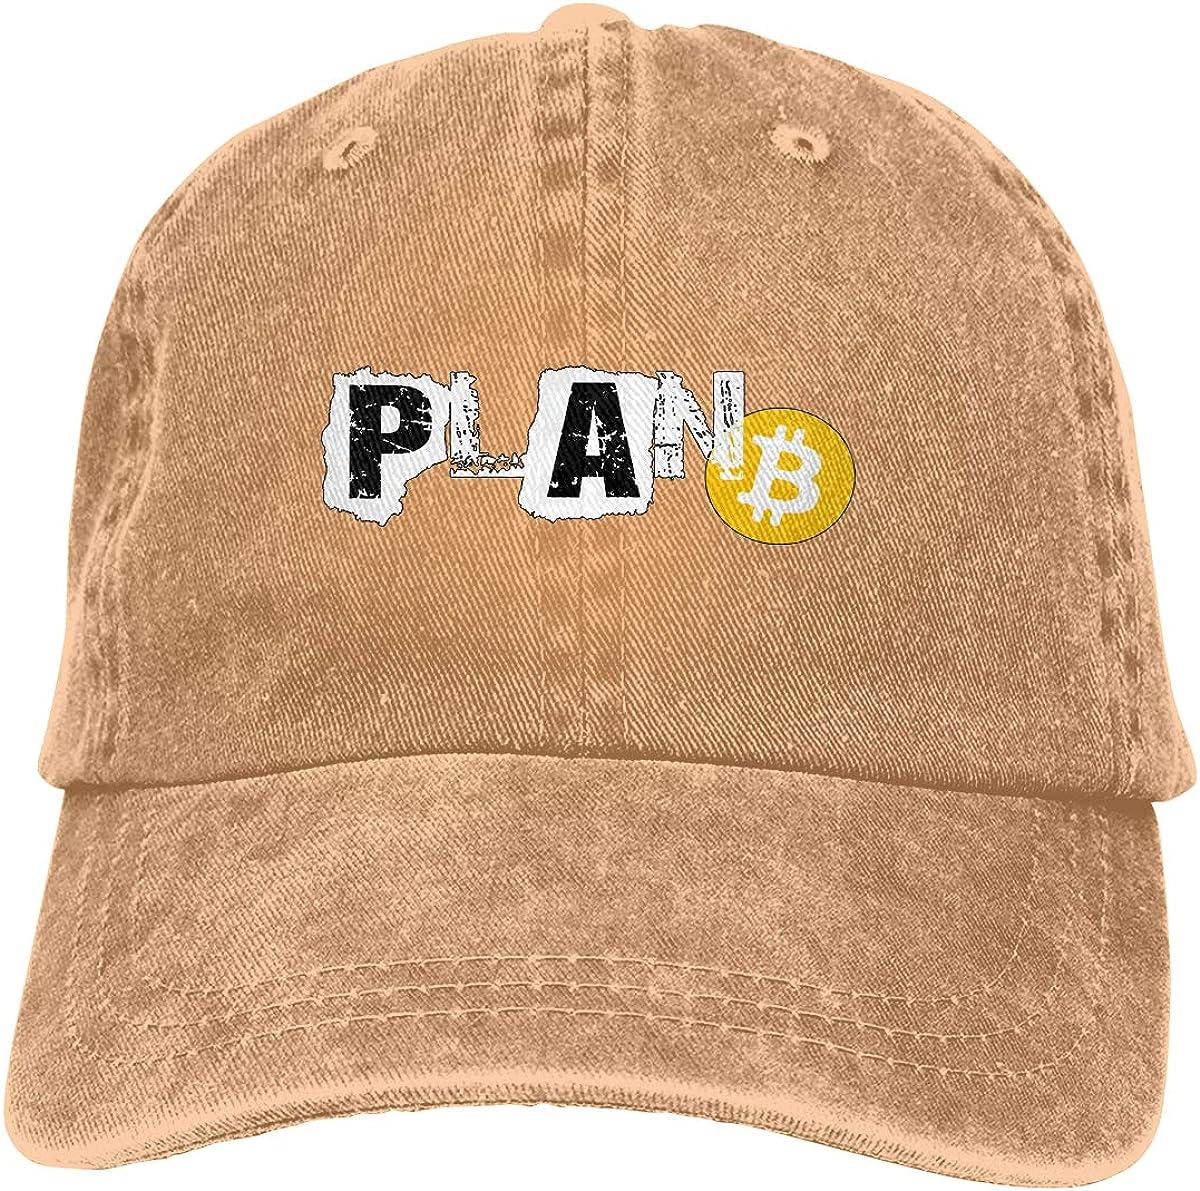 Plan B Vintage Washed Dad Hat Funny Adjustable Baseball Cap Men Women Bitcoin